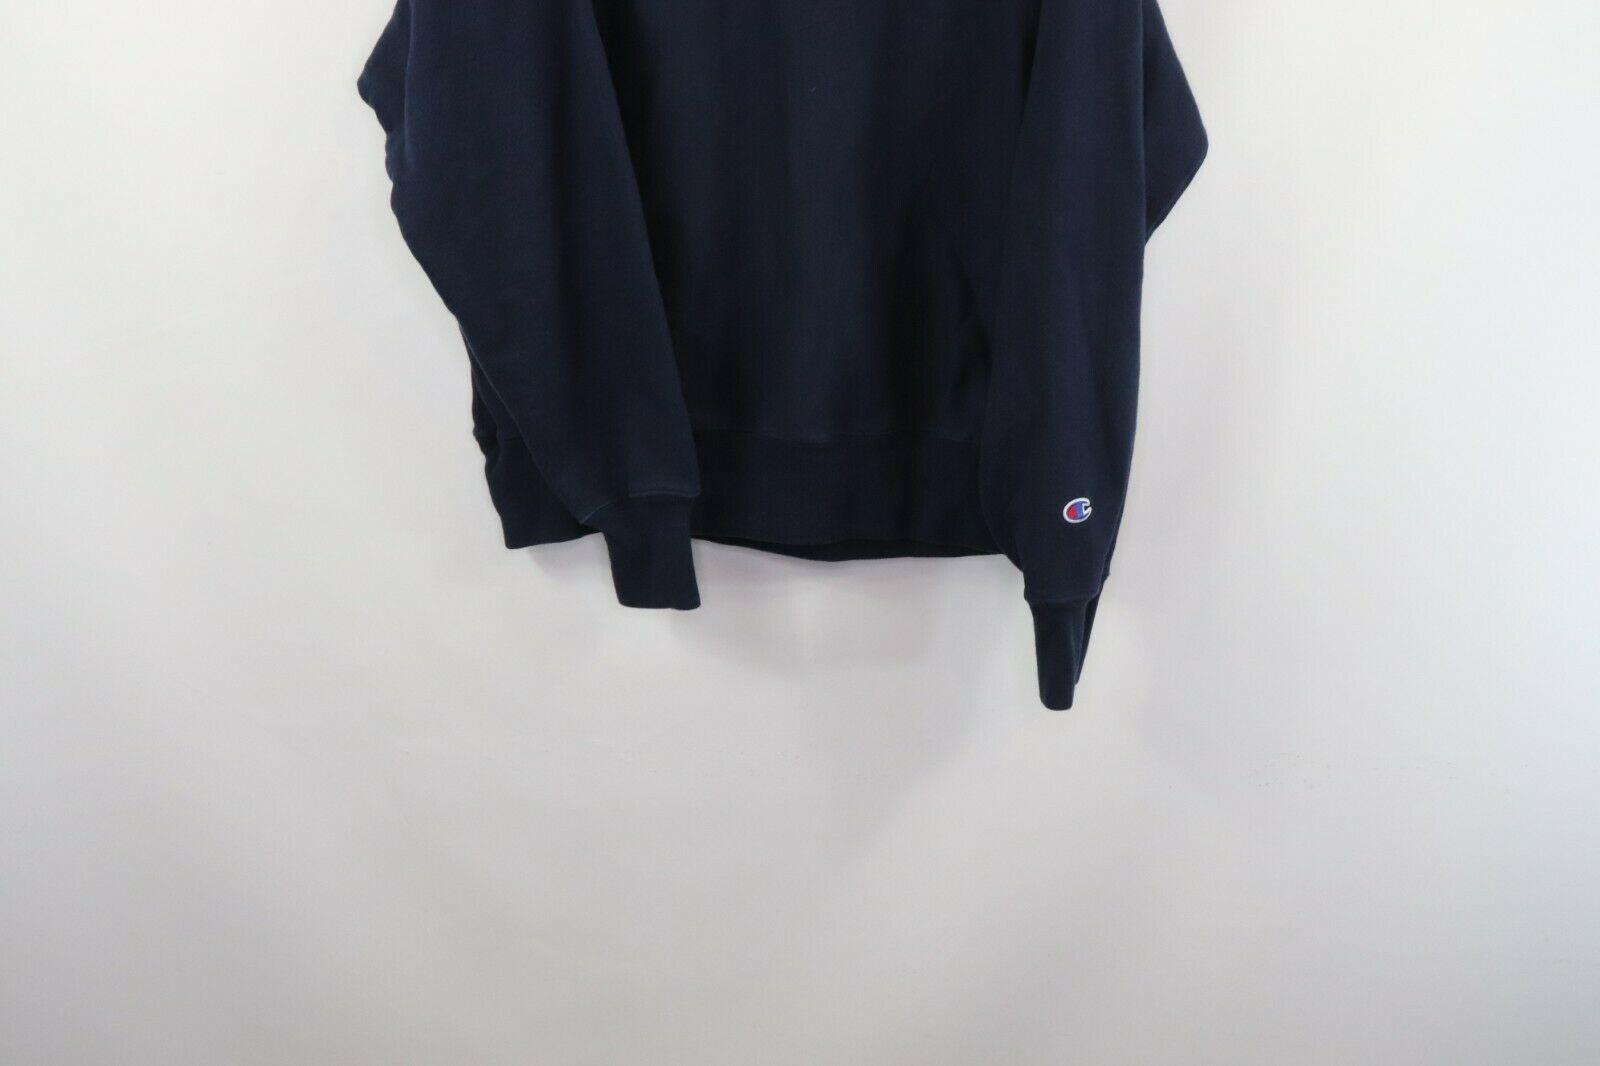 Champion Reverse Weave Mens Large Optimize Spell Out Crewneck Sweatshirt Blue image 3